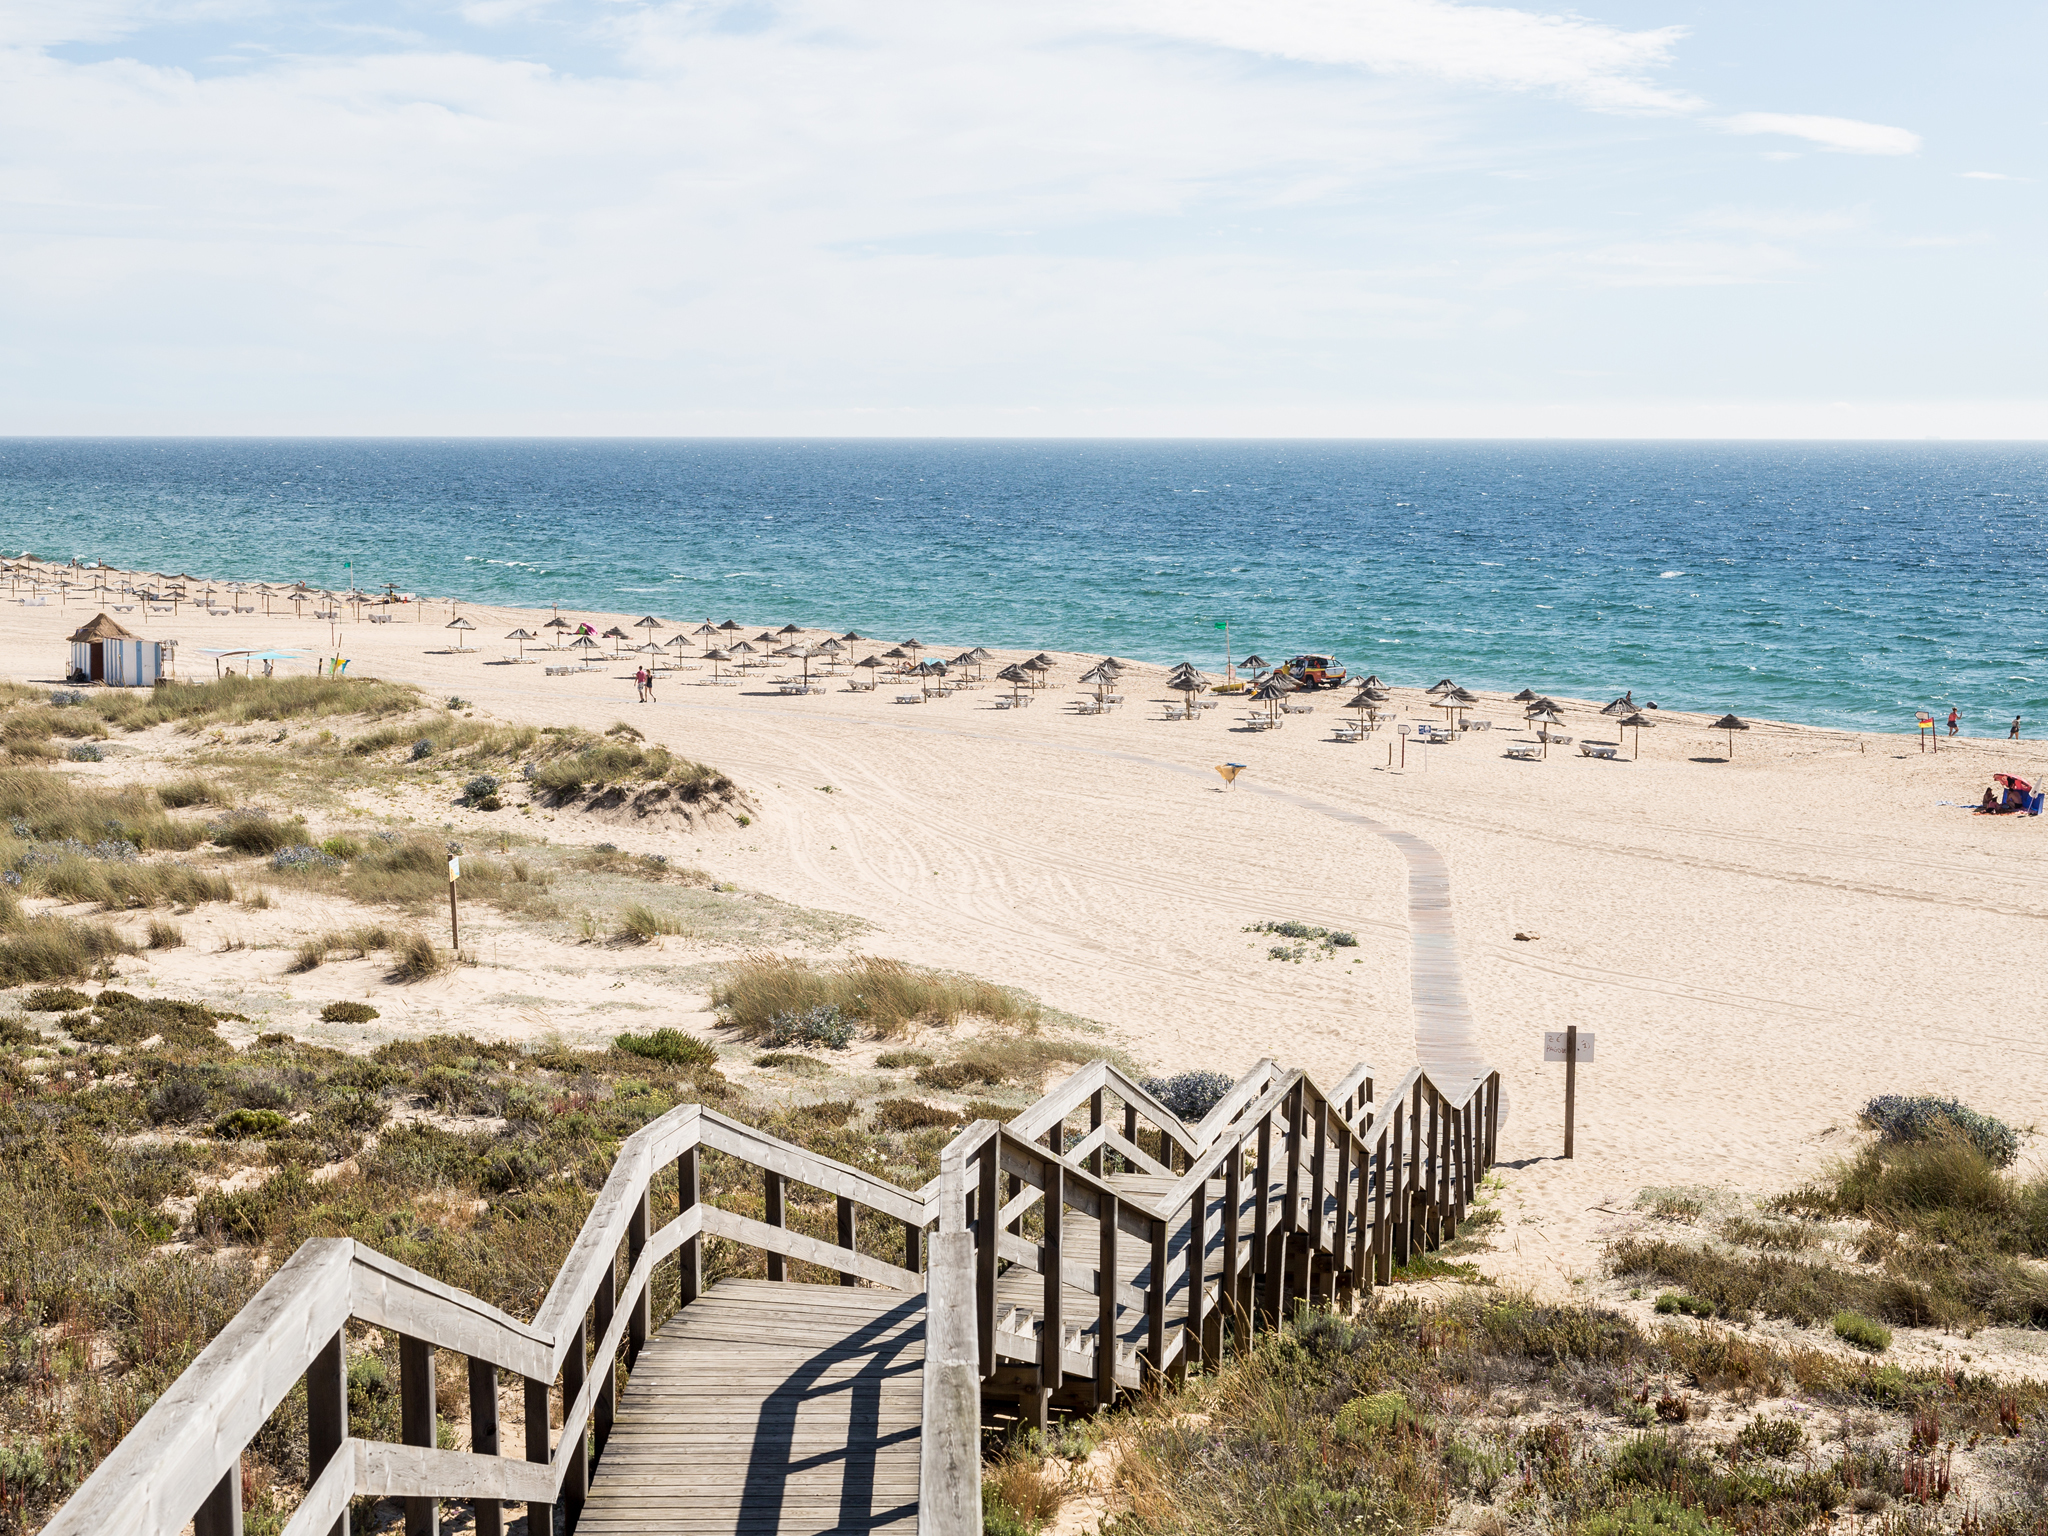 Praia de Alfarim - Meco